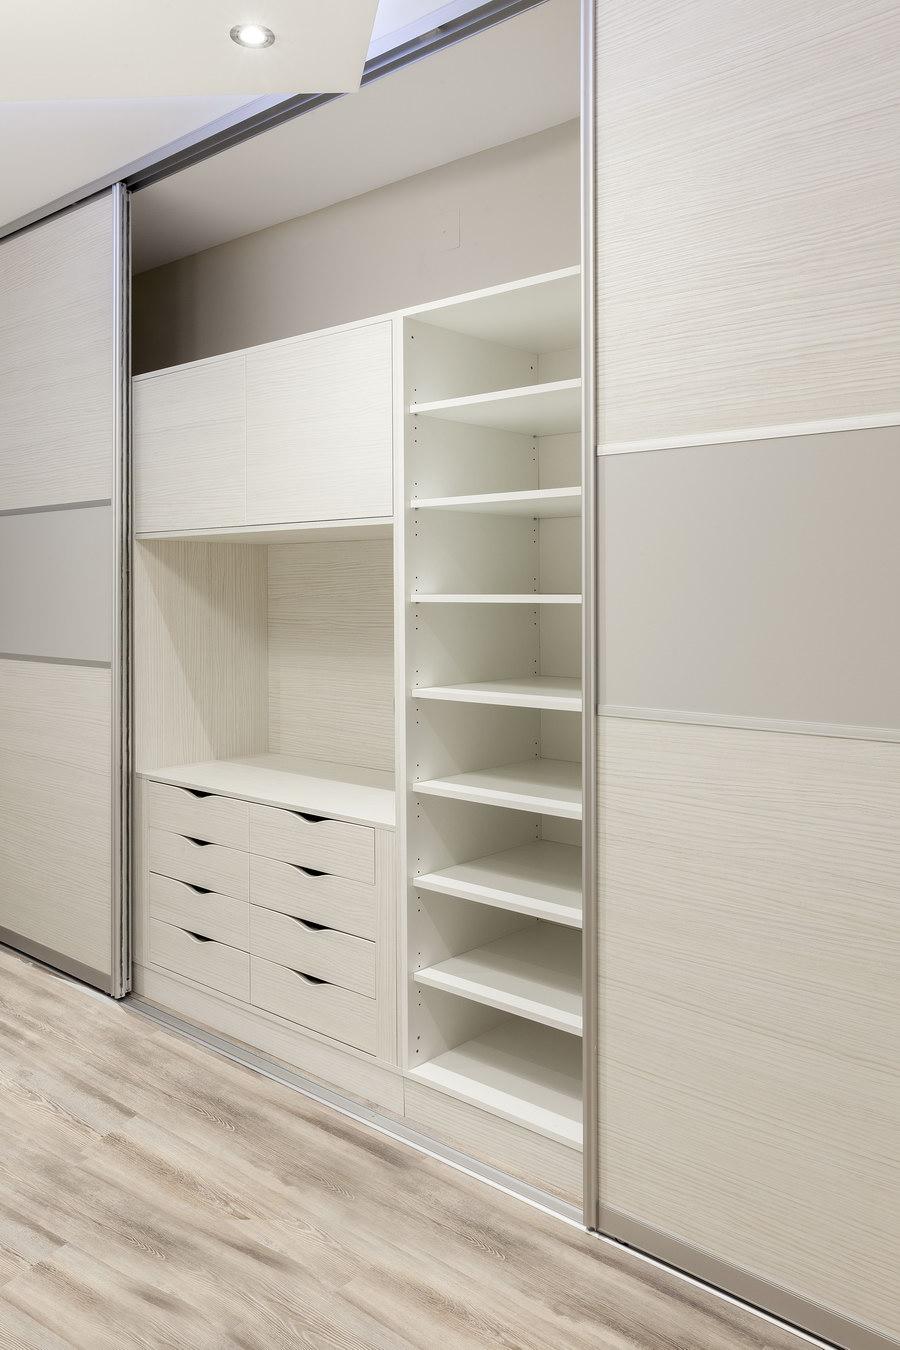 residencial_closets_07